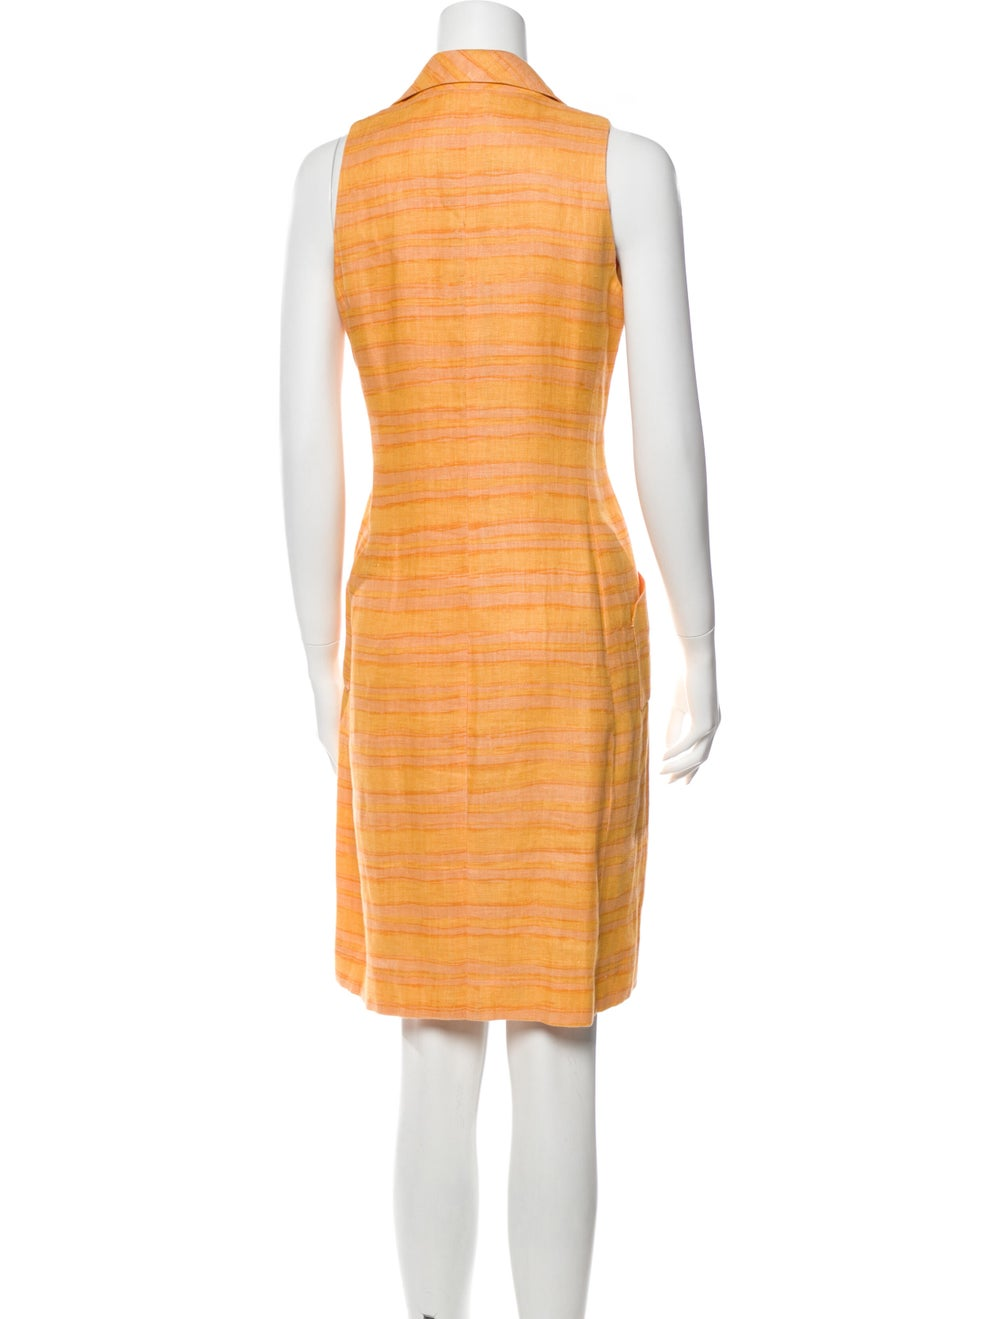 Oscar de la Renta Striped Knee-Length Dress Orange - image 3